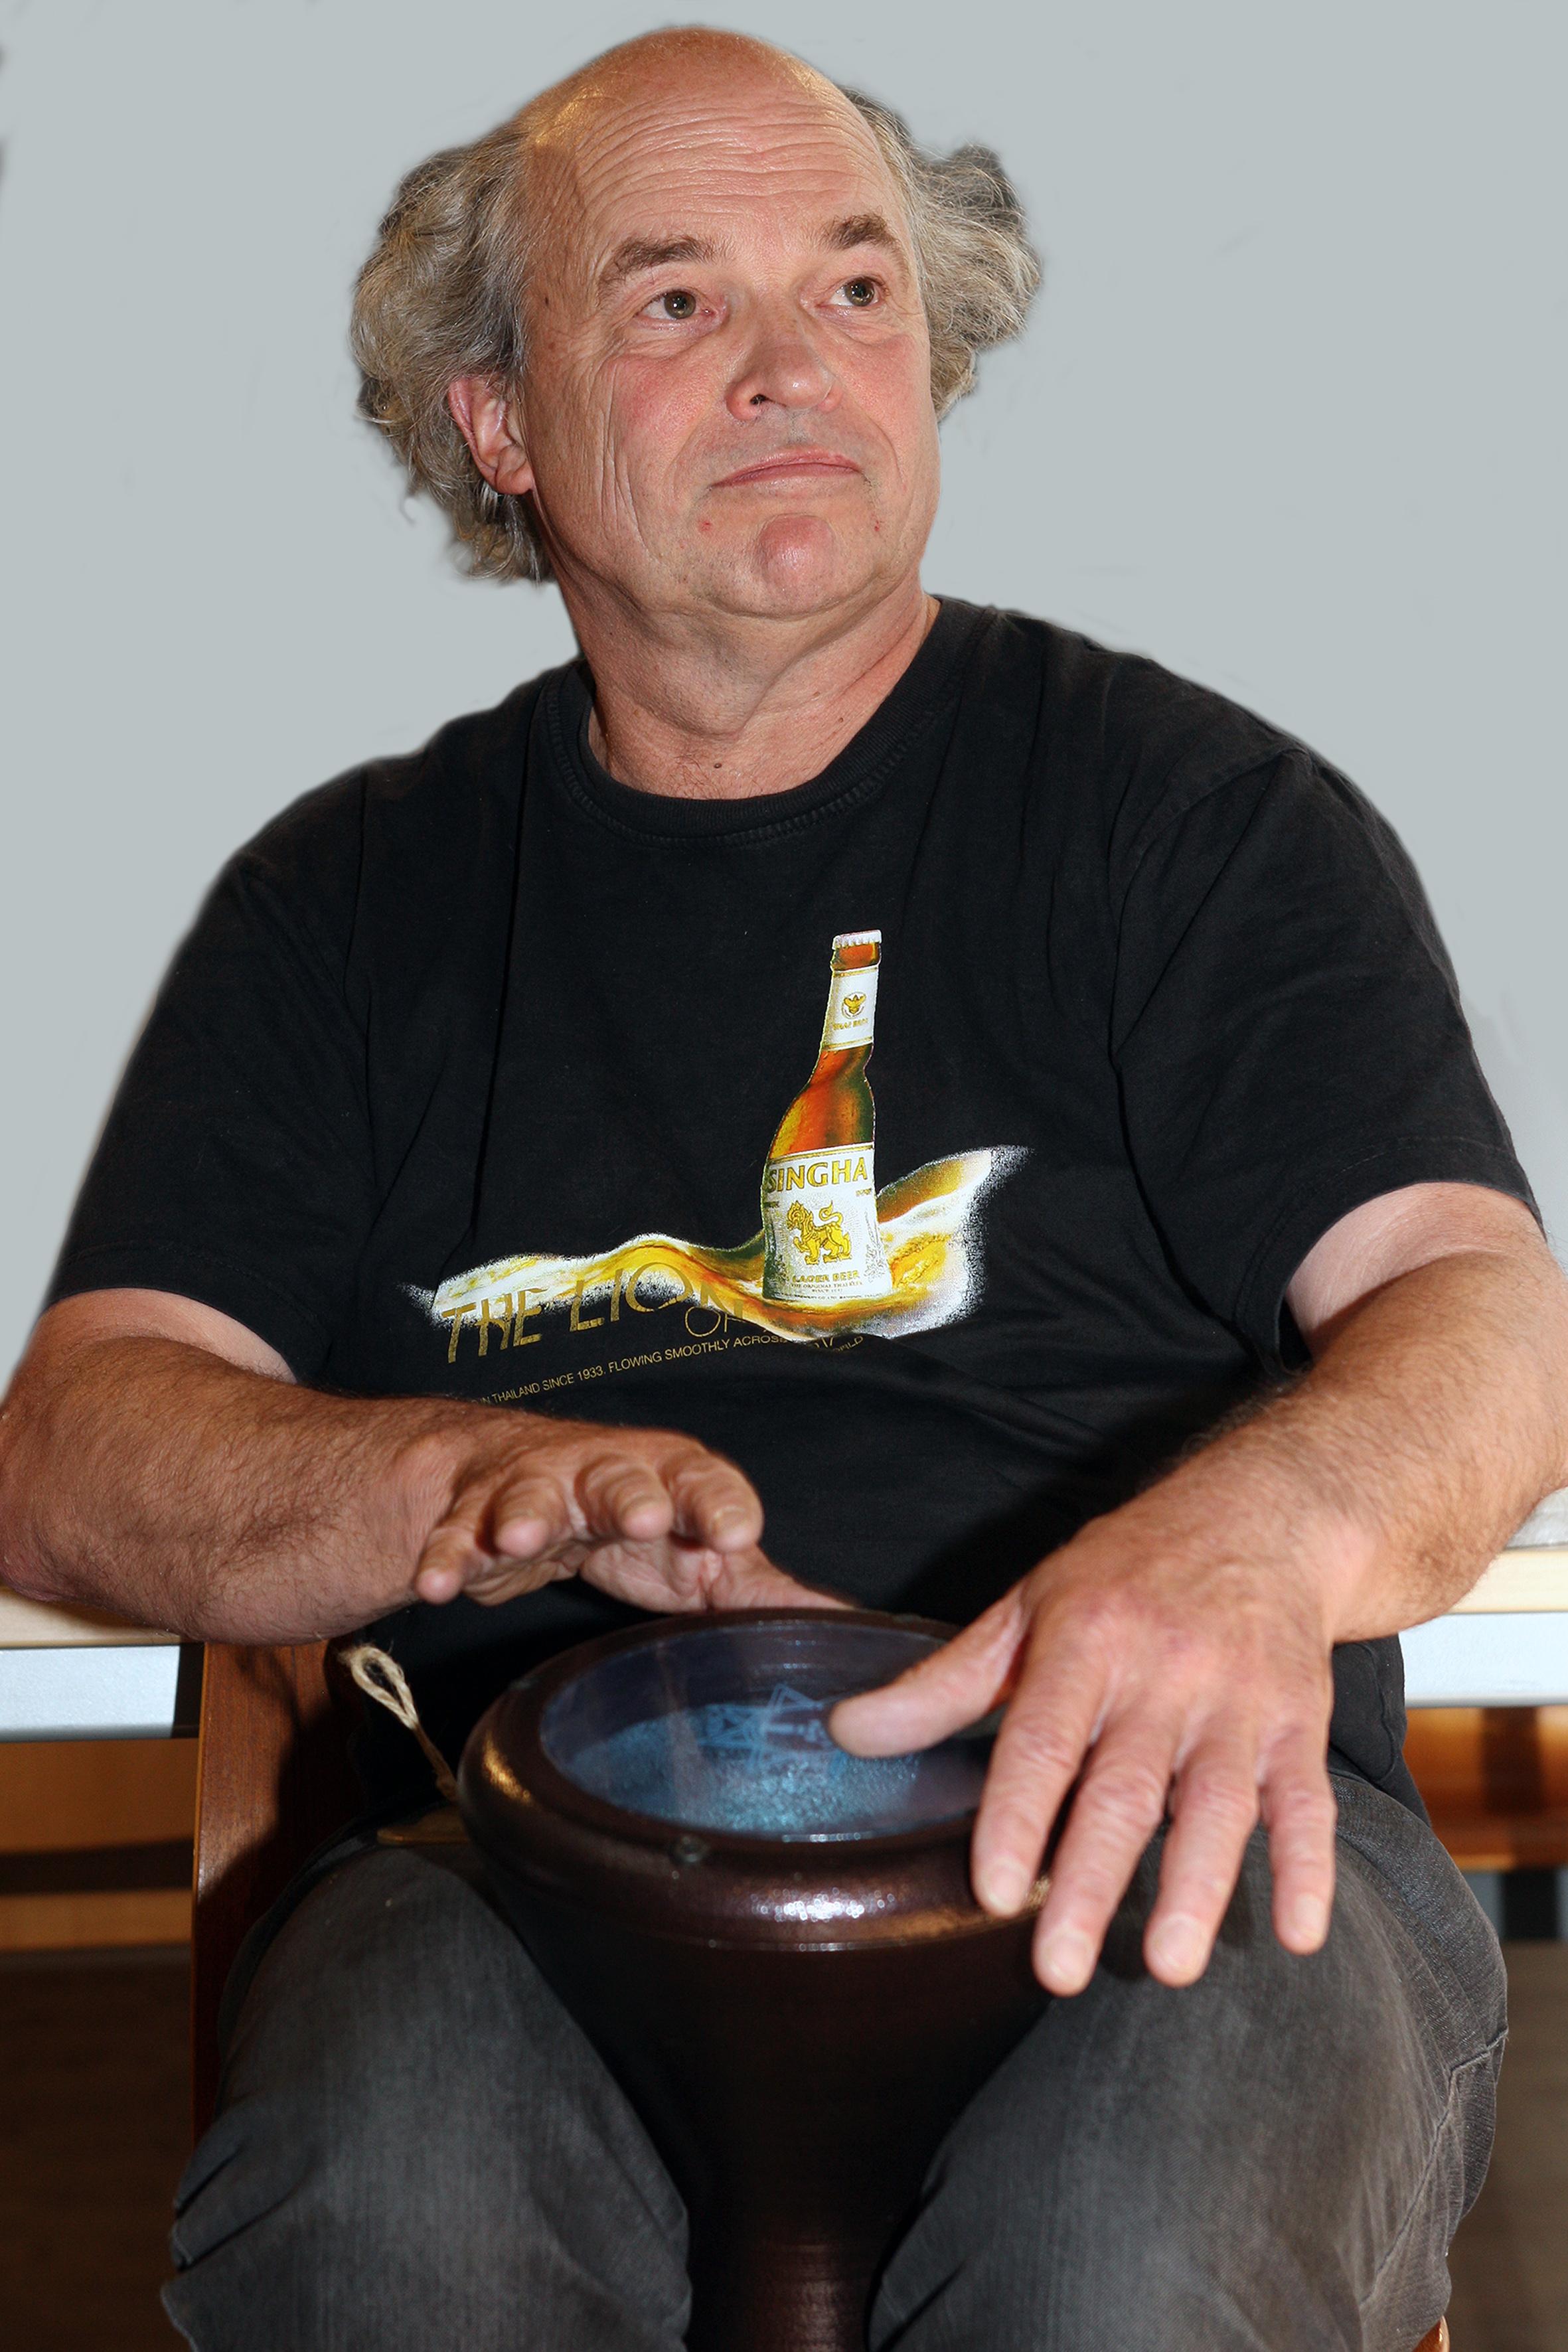 Paul Freriks